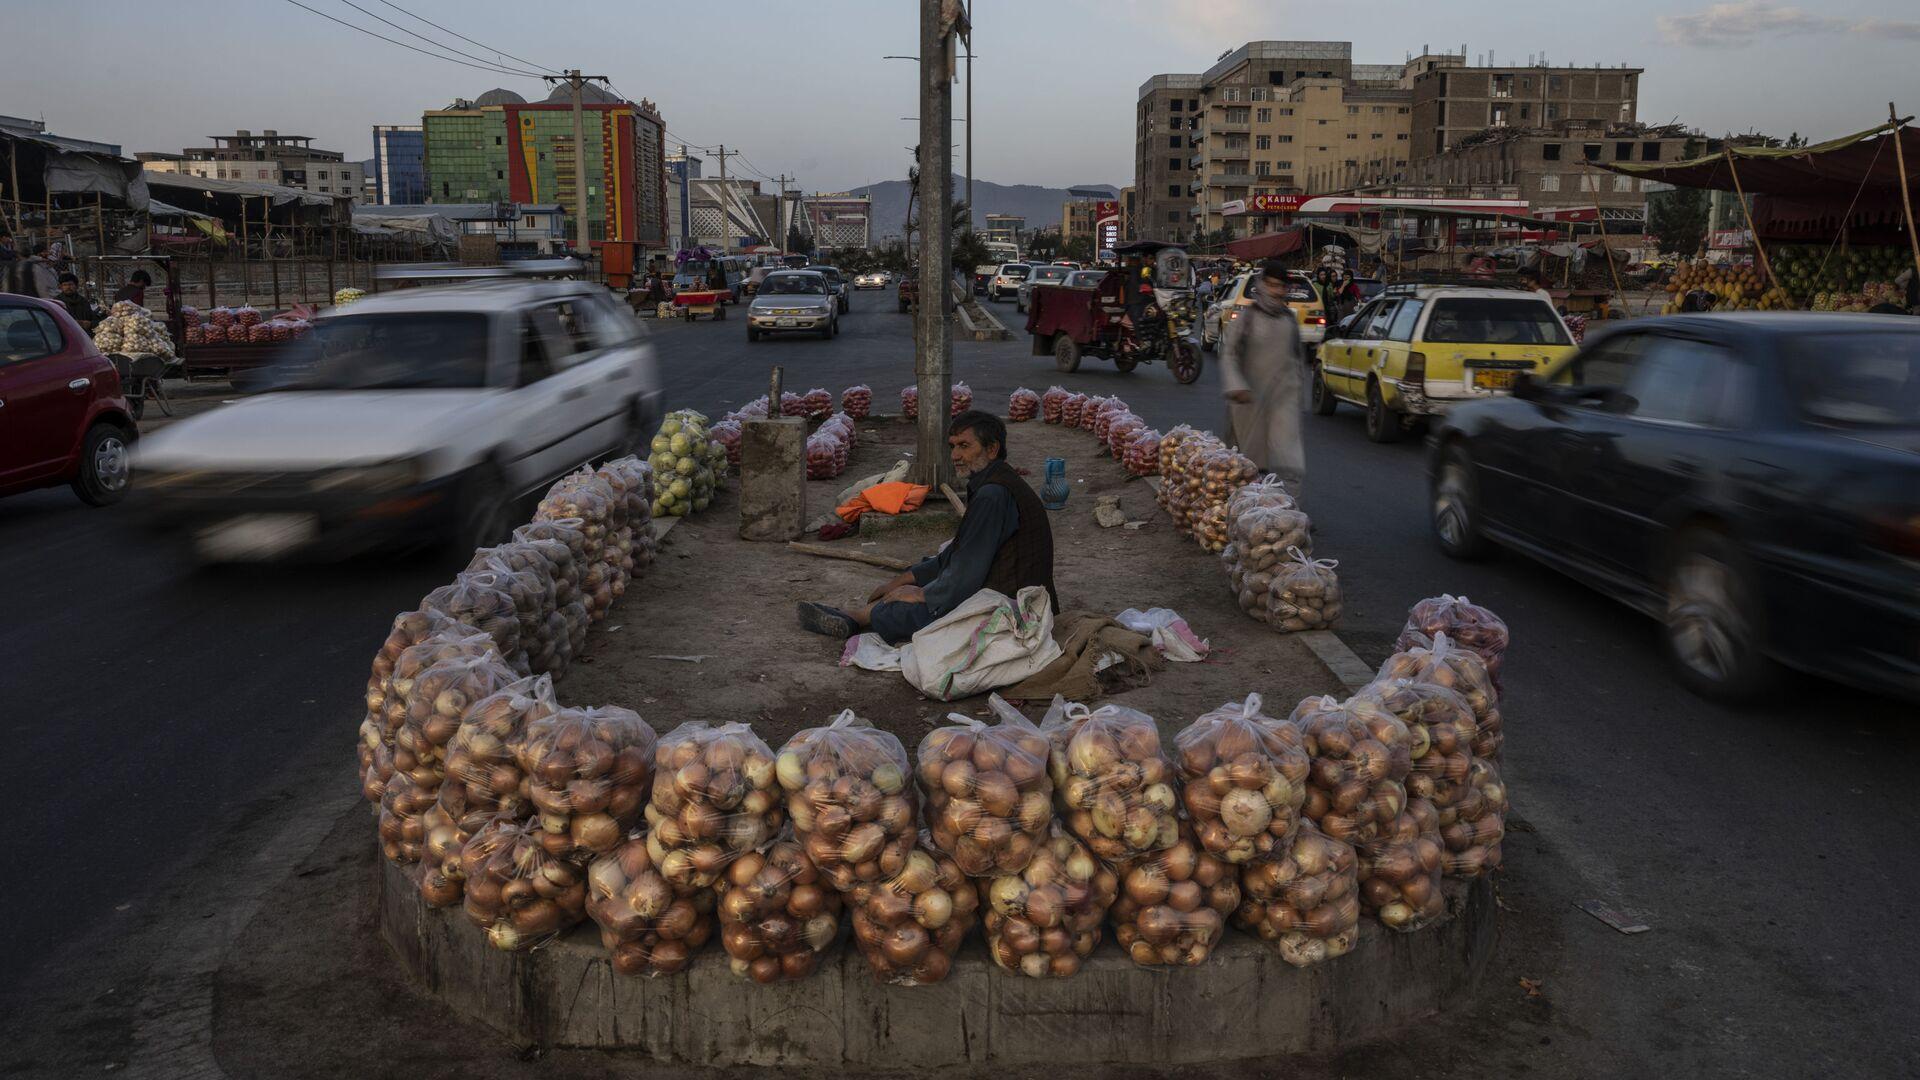 Афганец продает фрукты на улице в Кабуле, Афганистан - Sputnik Азербайджан, 1920, 07.10.2021